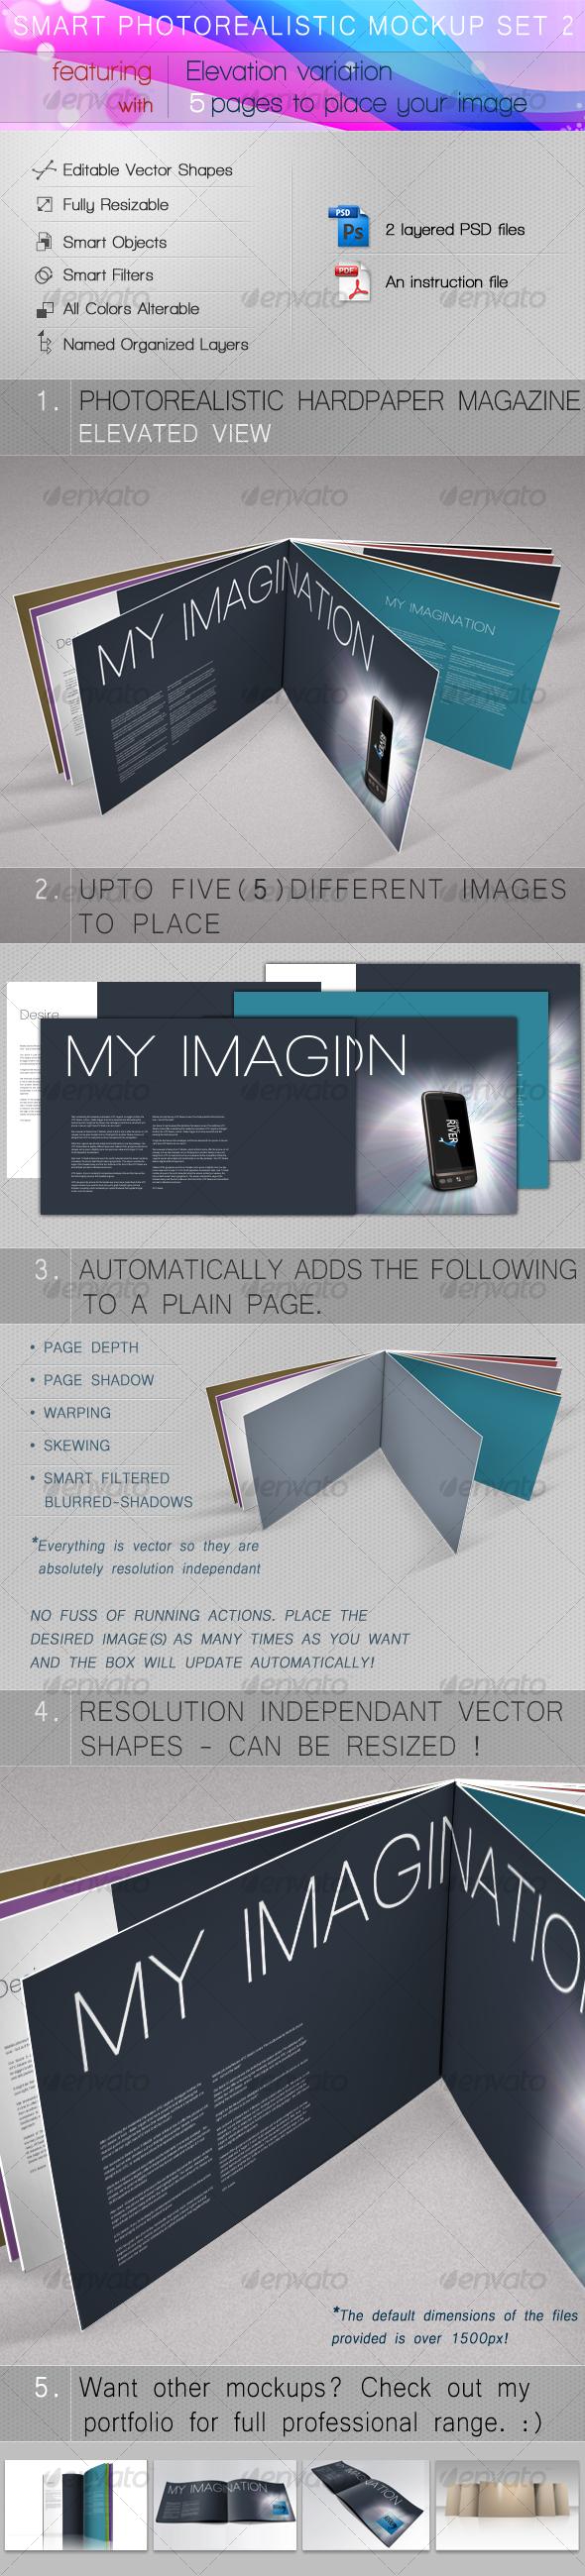 GraphicRiver Smart Photorealistic Mockup Set 2 105841